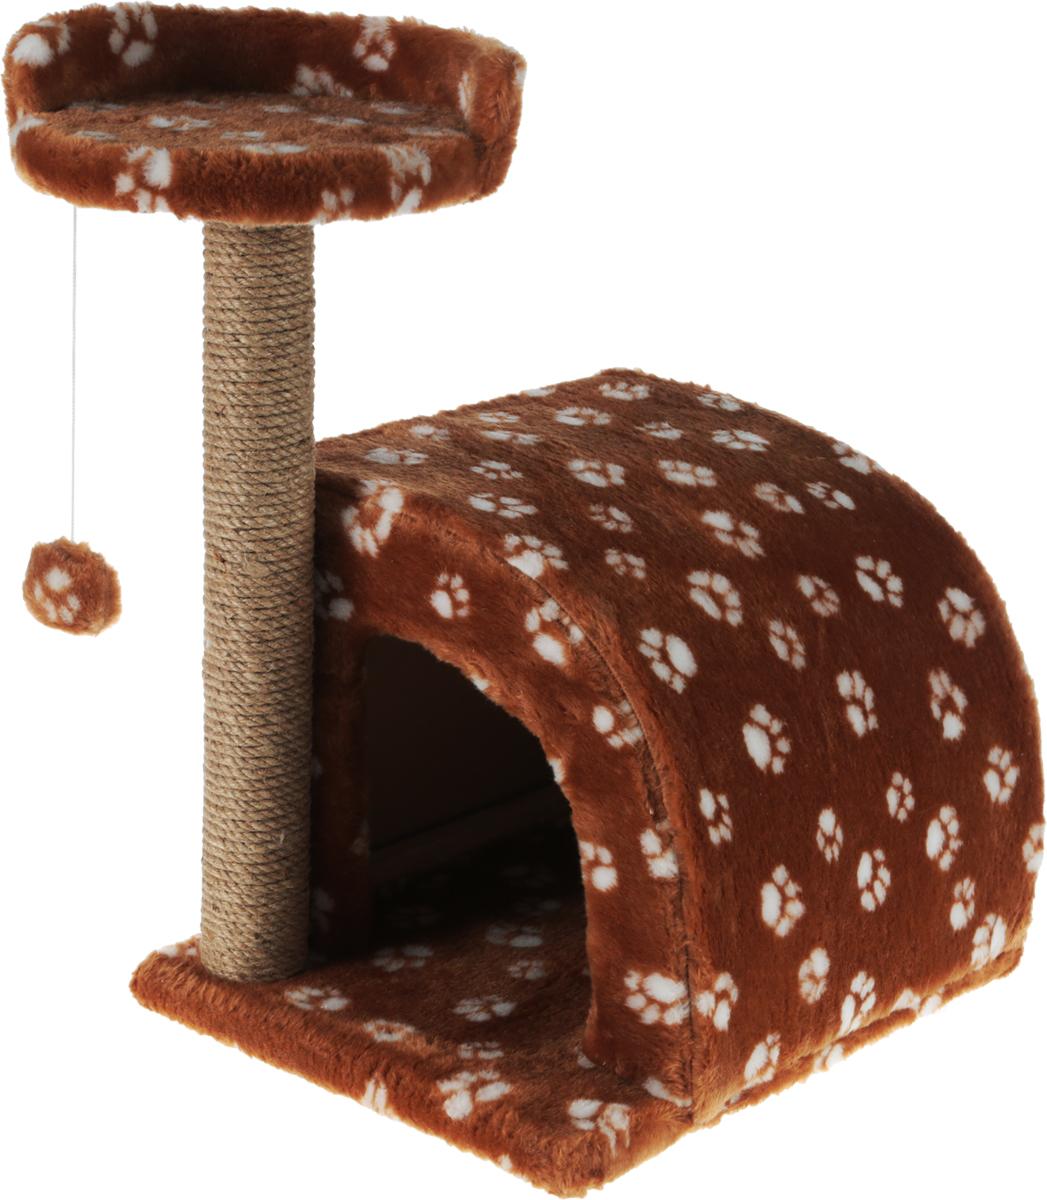 Домик-когтеточка Меридиан, полукруглый, цвет: коричневйы, белый, бежевый, 54 х 40 х 59 см домик perseiline кошка для кошек 38 40 40 см 00025 дмс 4